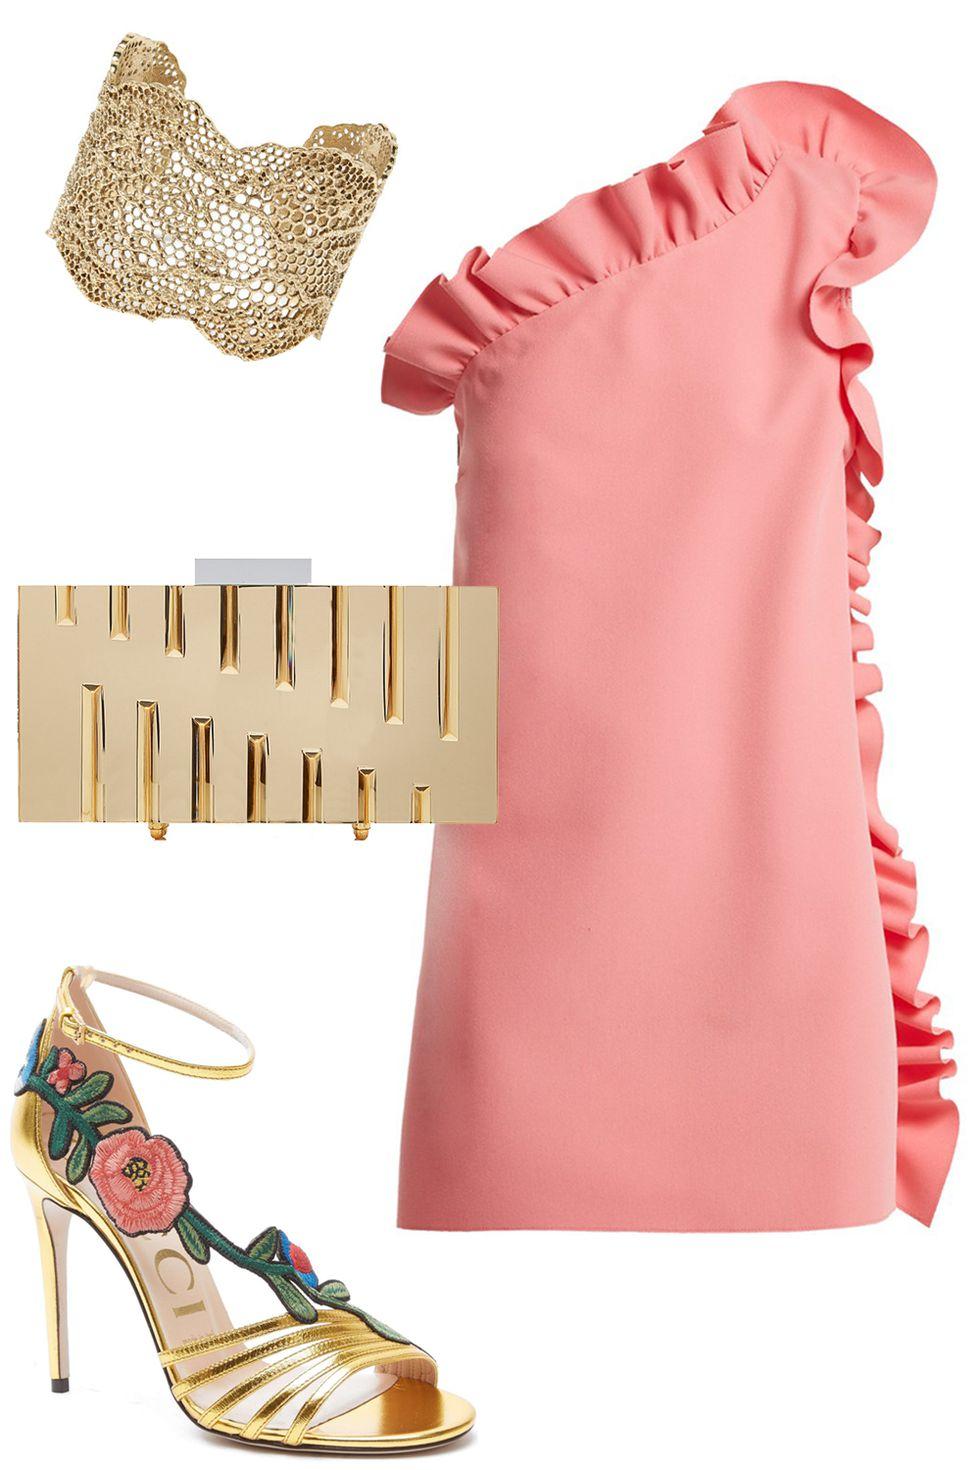 what-to-wear-for-a-summer-wedding-guest-outfit-pink-light-dress-mini-offshoulder-ruffle-tan-bag-clutch-gold-bracelet-tan-shoe-sandalh-dinner.jpg